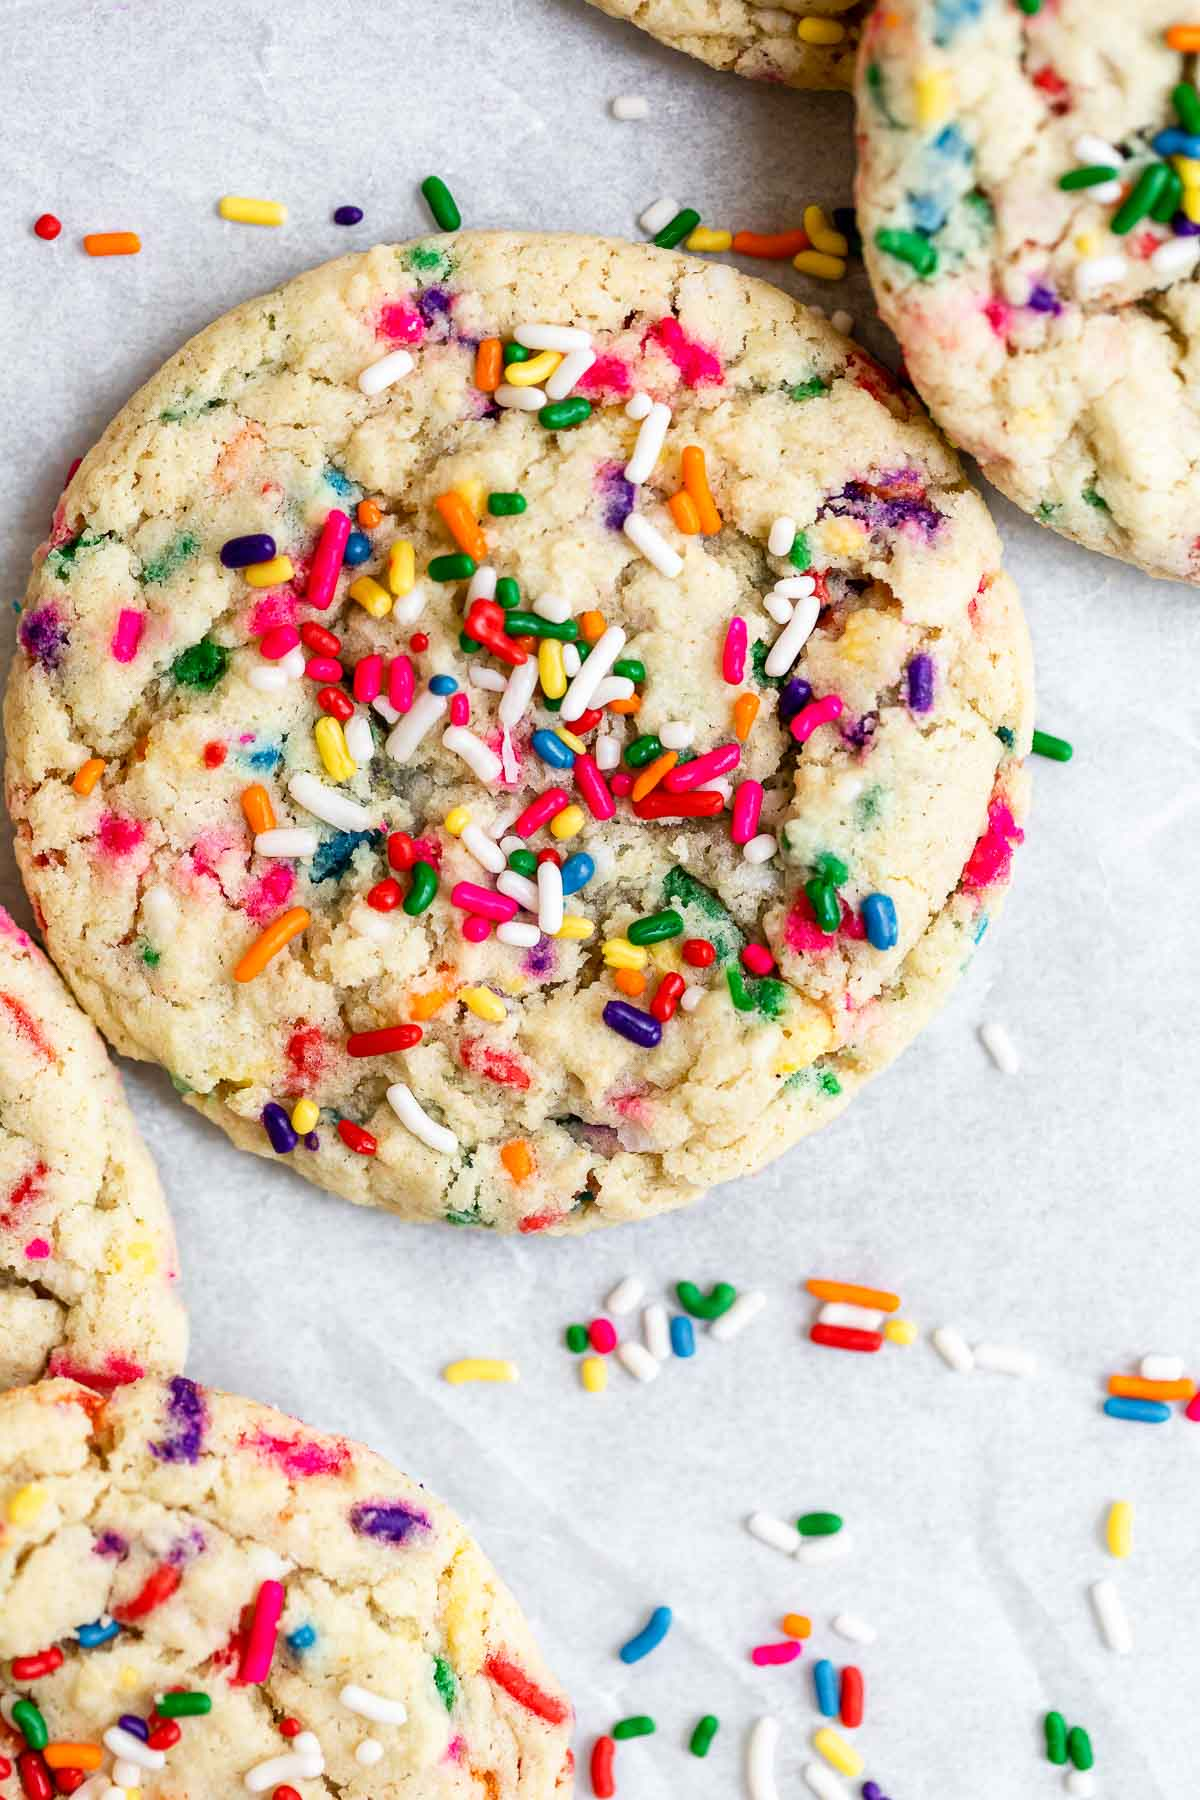 vegan gluten free funfetti sugar cookies with rainbow sprinkles